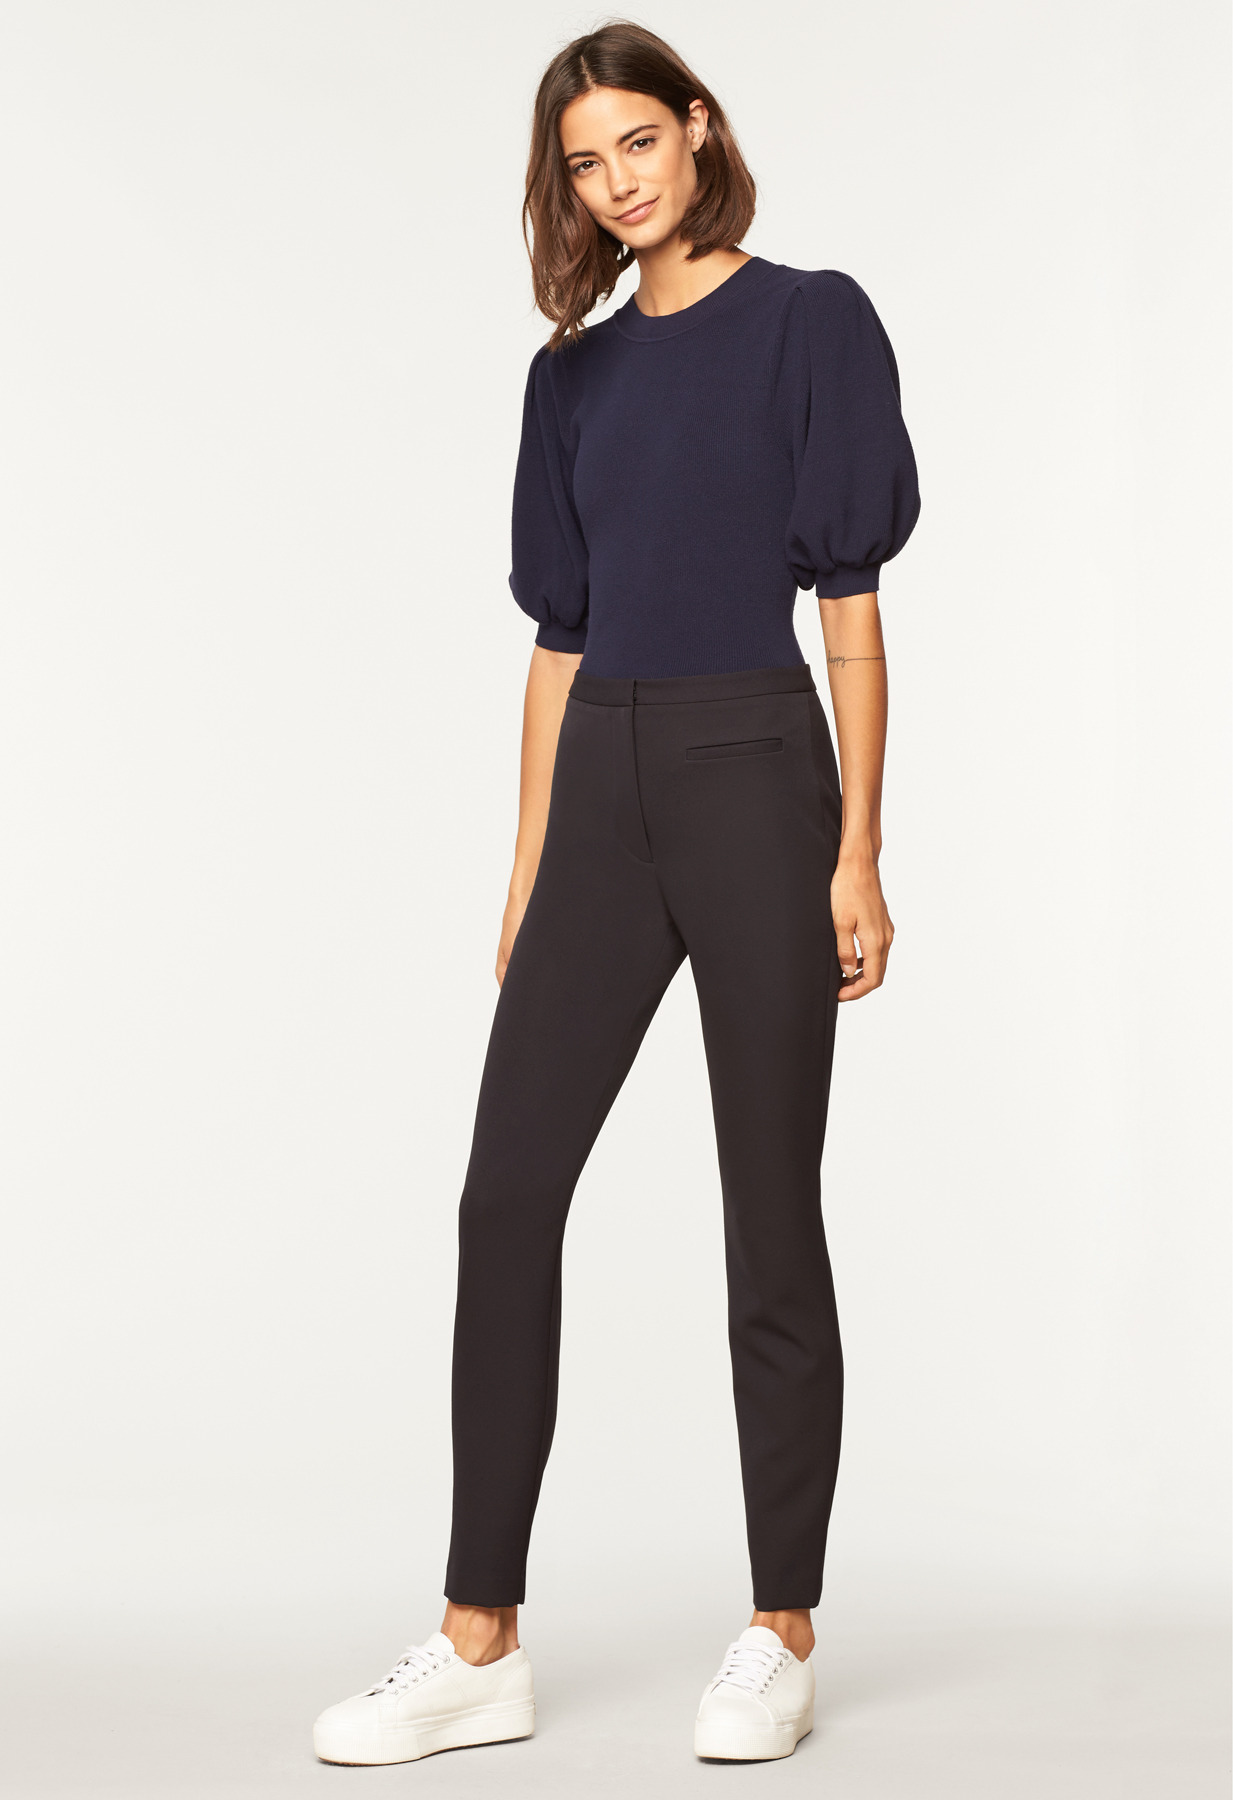 53fac5368e3 MILLY Contemporary Clothing